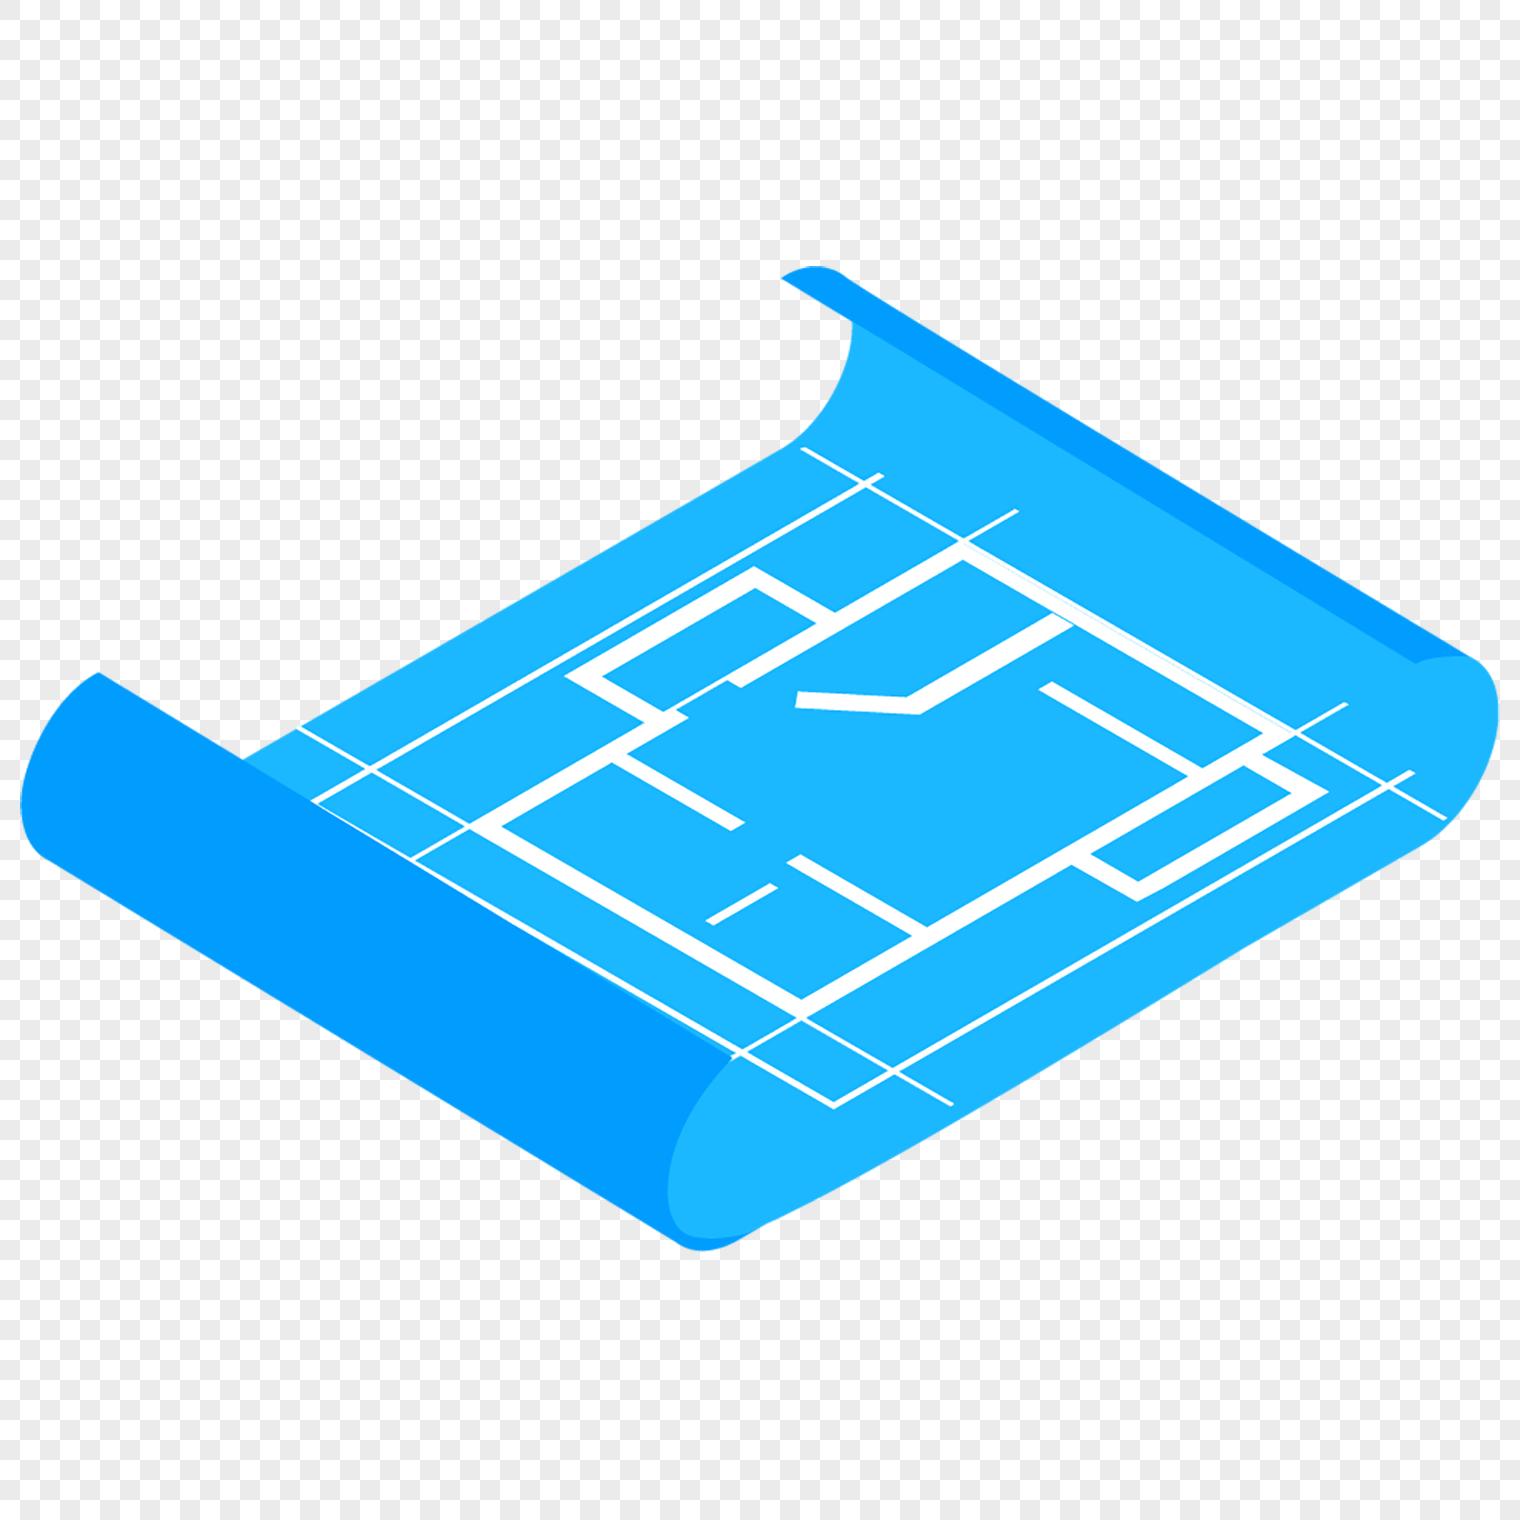 Circuit diagram png image_picture free download 400383239_lovepik.com